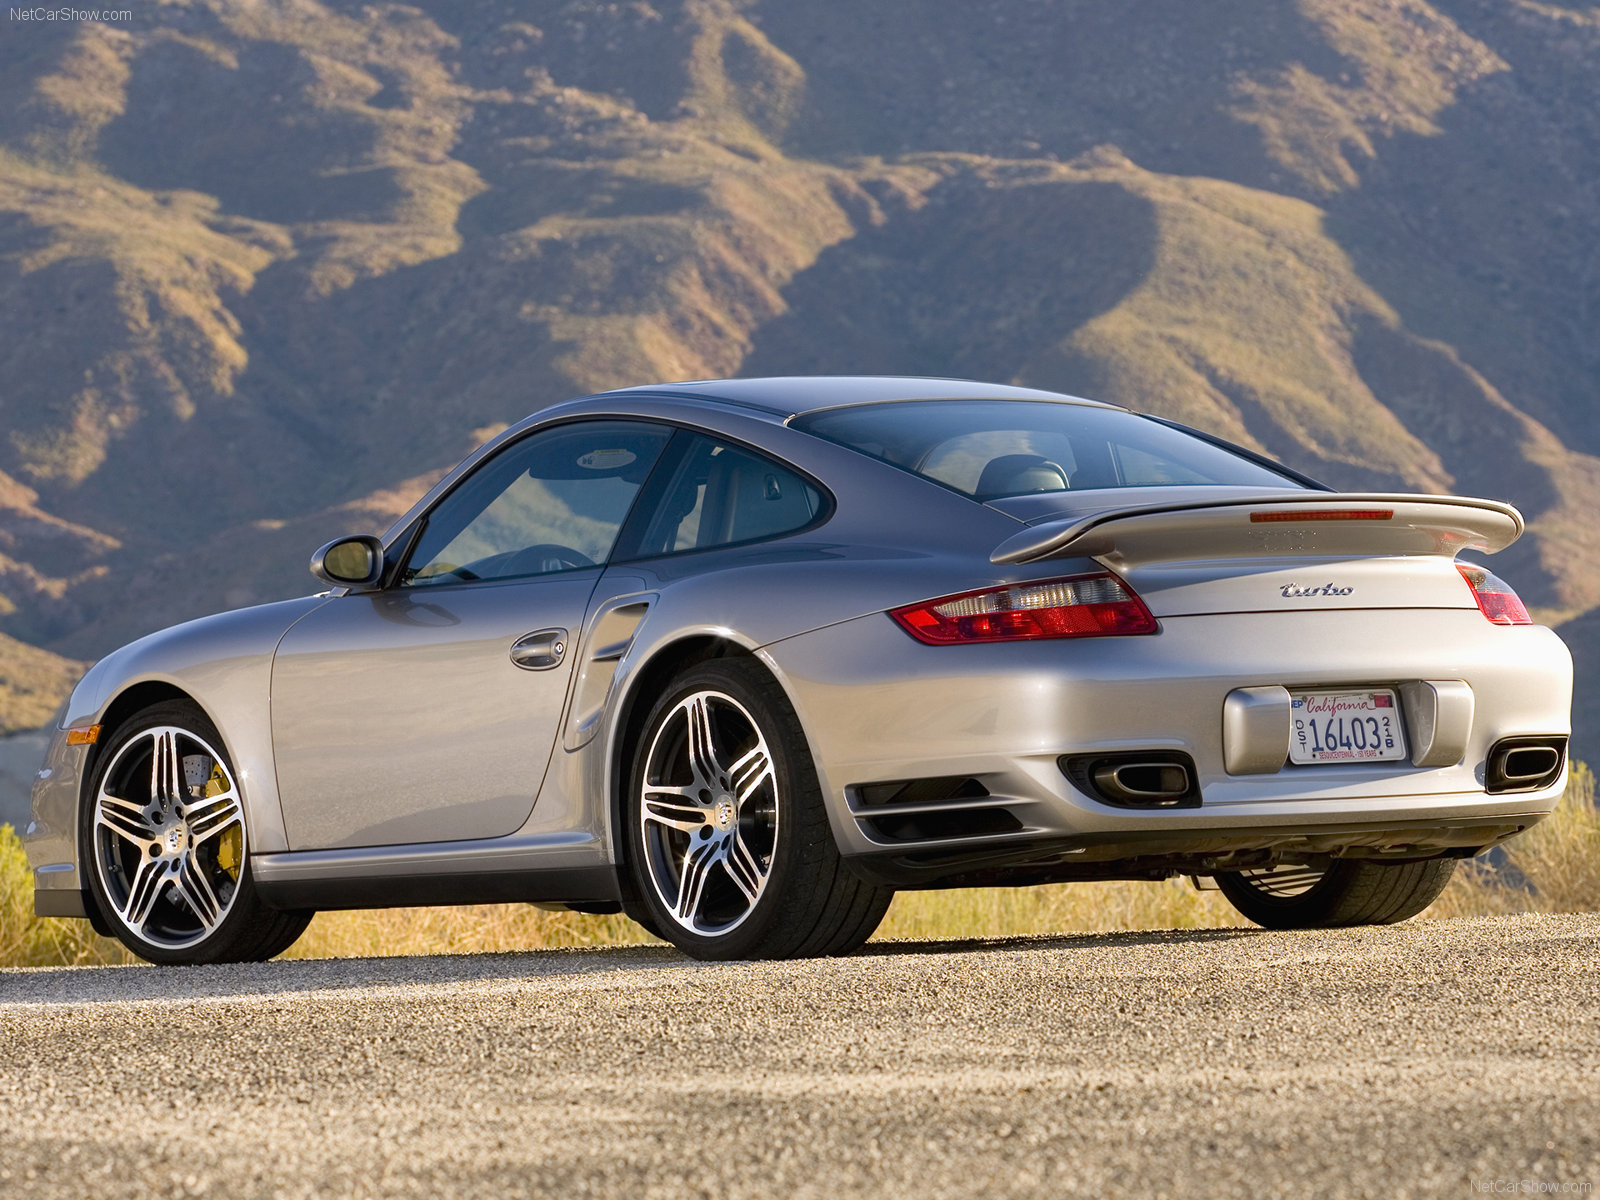 2007 Silver Porsche 911 Turbo Wallpapers